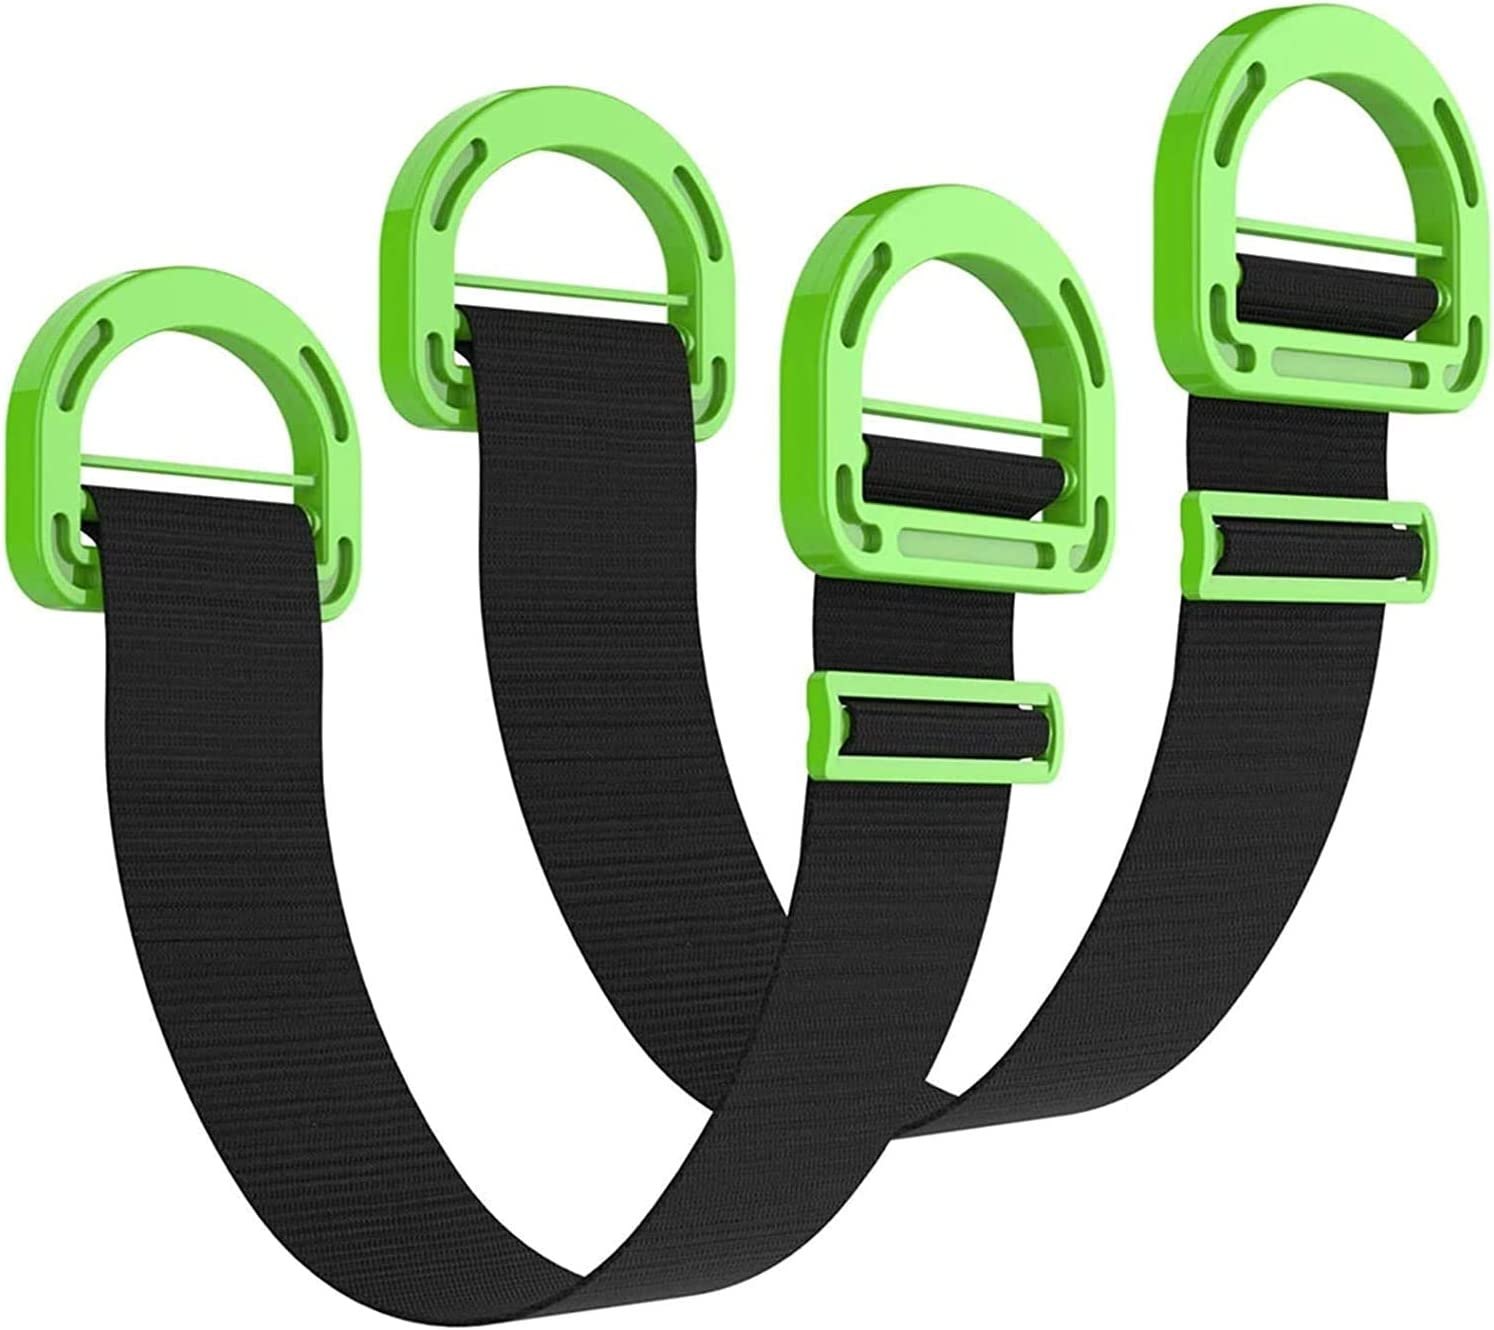 Luffa elves Adjustable Lifting Moving Straps, Lifting Belt, Heavy Lifting Belt Moving and Lifting System, Heavy Furniture Multifunctional Conveyor Belt, Boxes, mattresses, Construction (2)